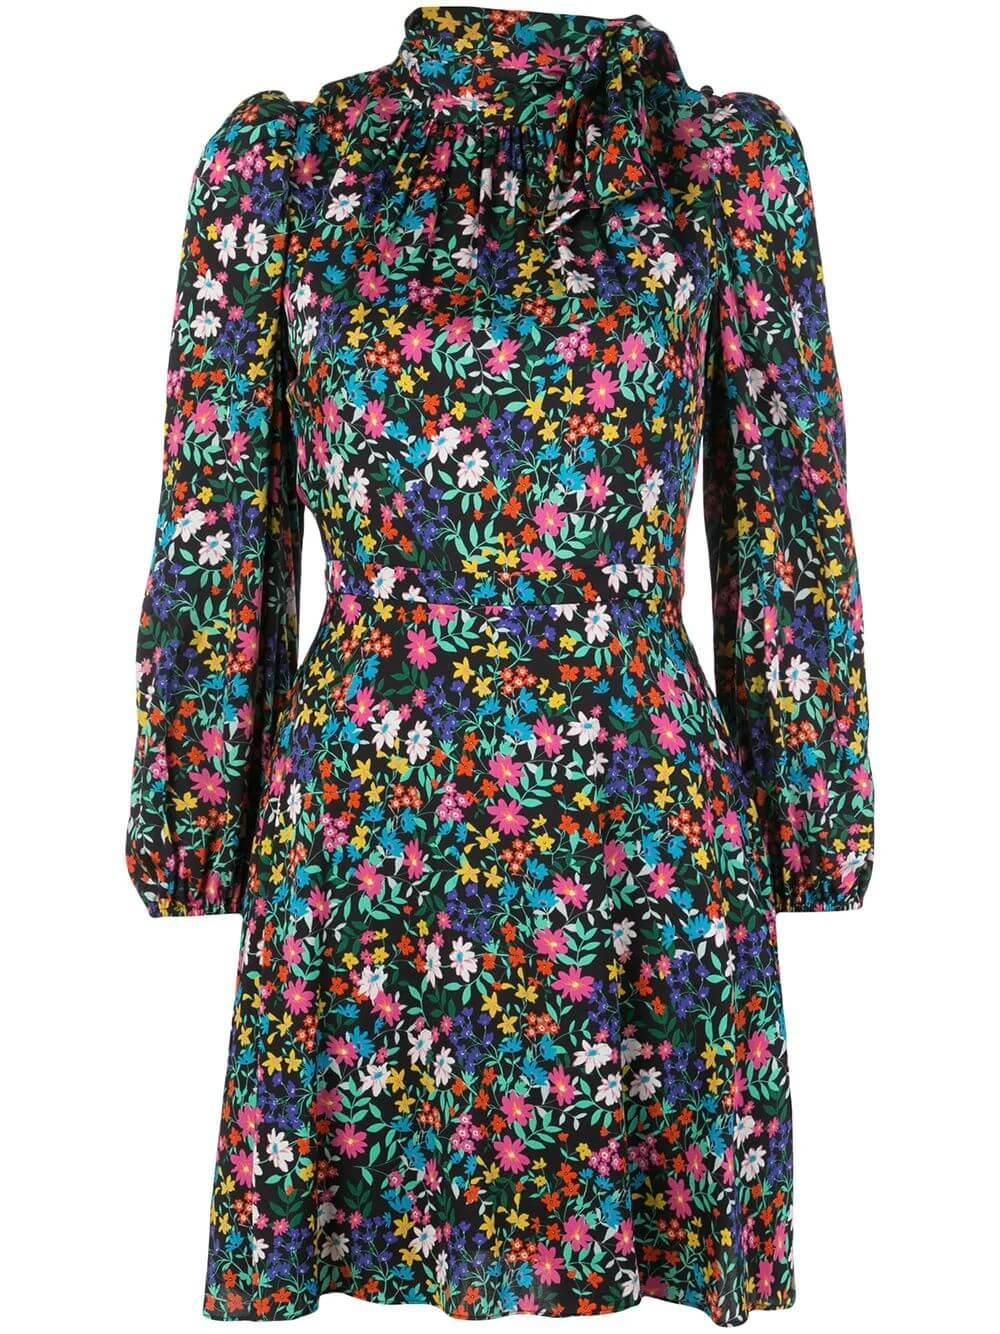 Garden Floral Stretch Silk Adele Dress Item # 24AD05